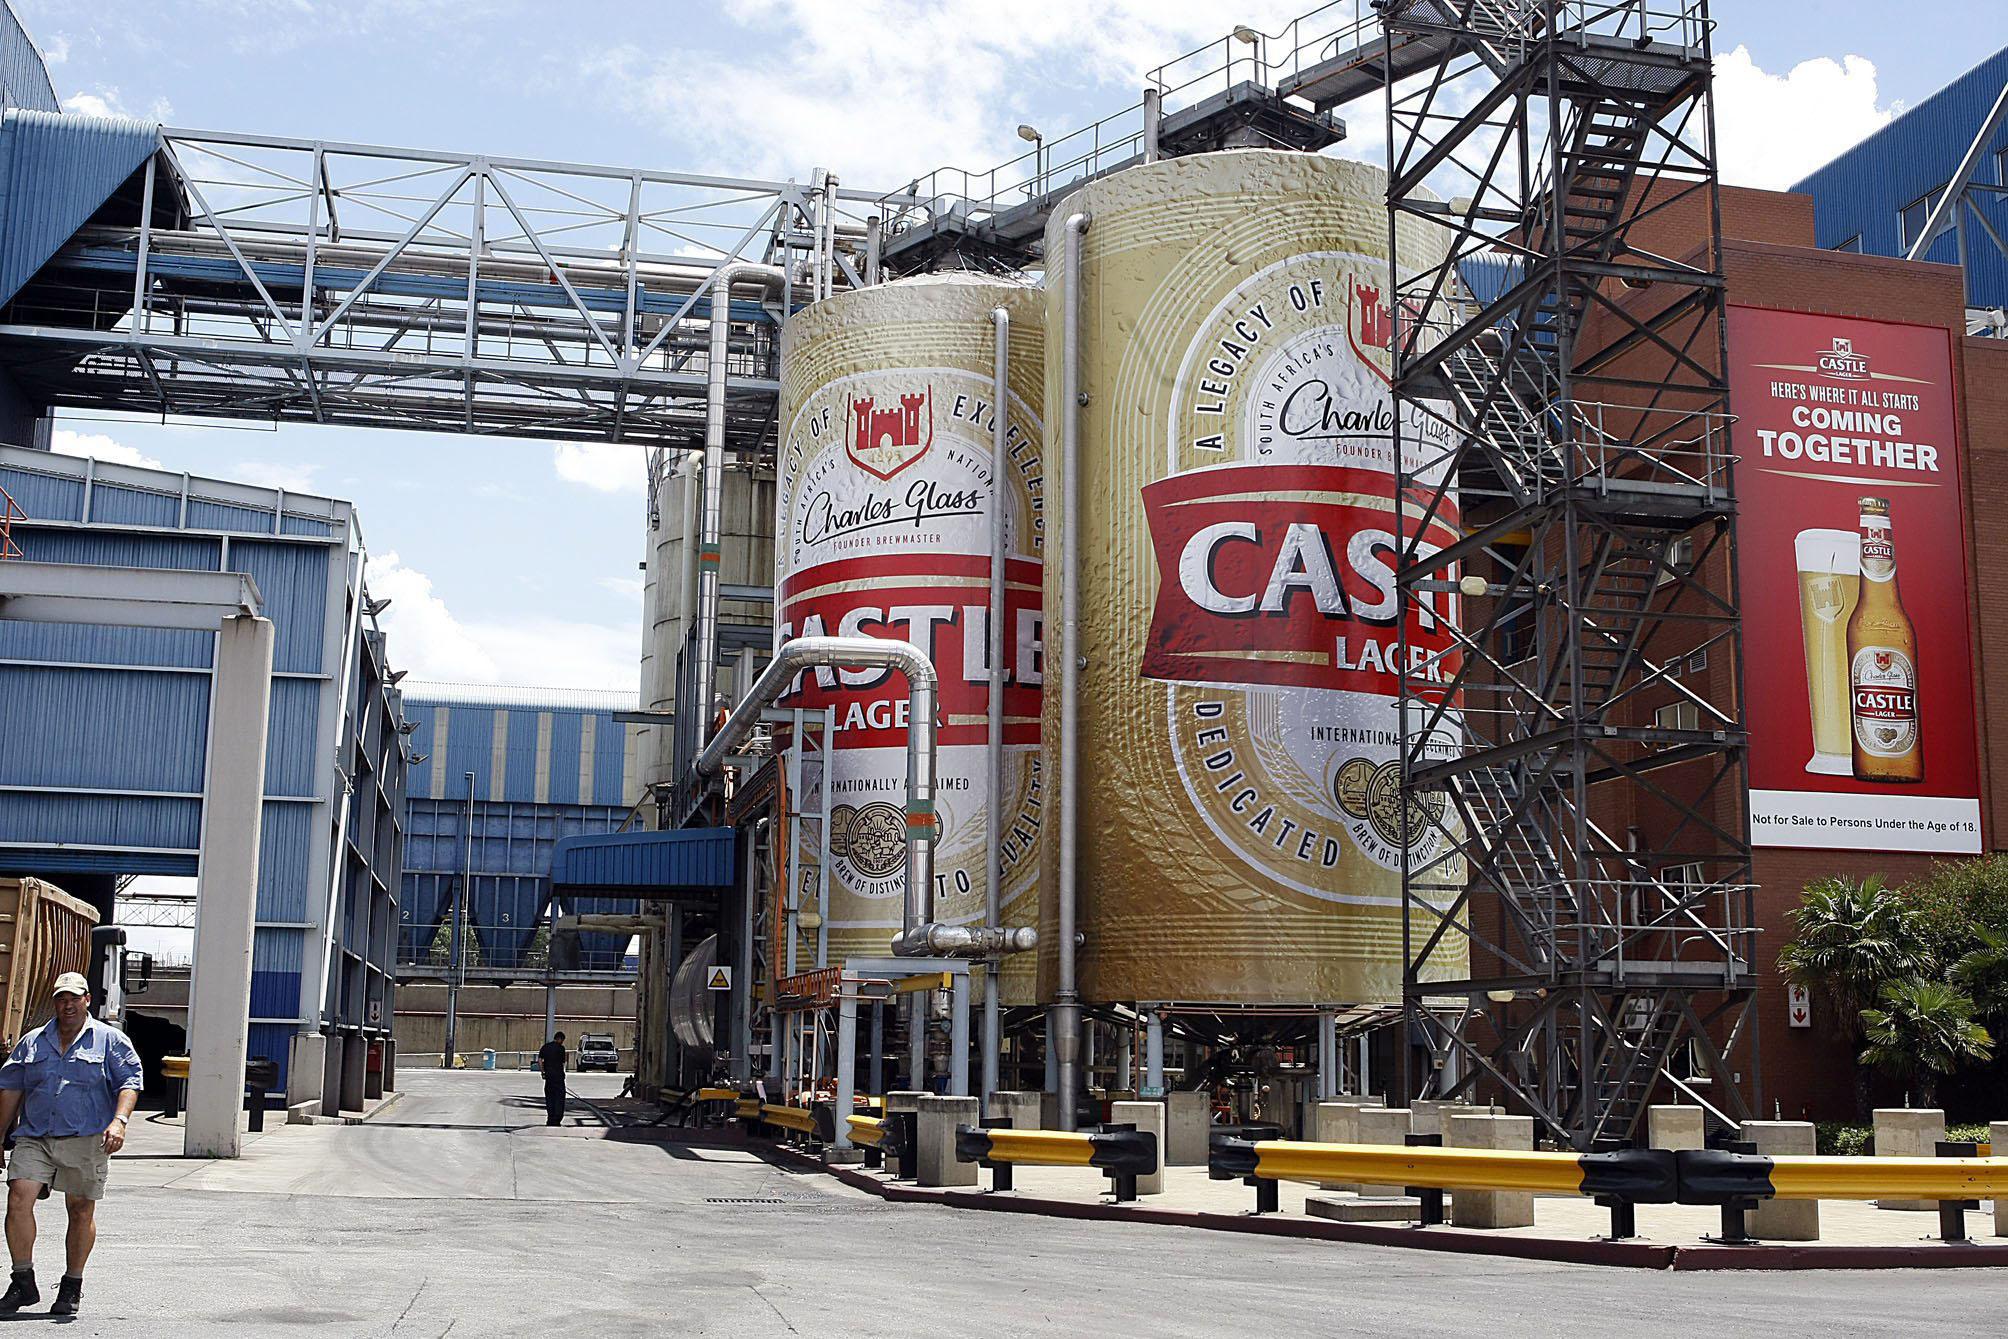 SAB, Heineken Halt Investment In South Africa Due To Alcohol Ban photo